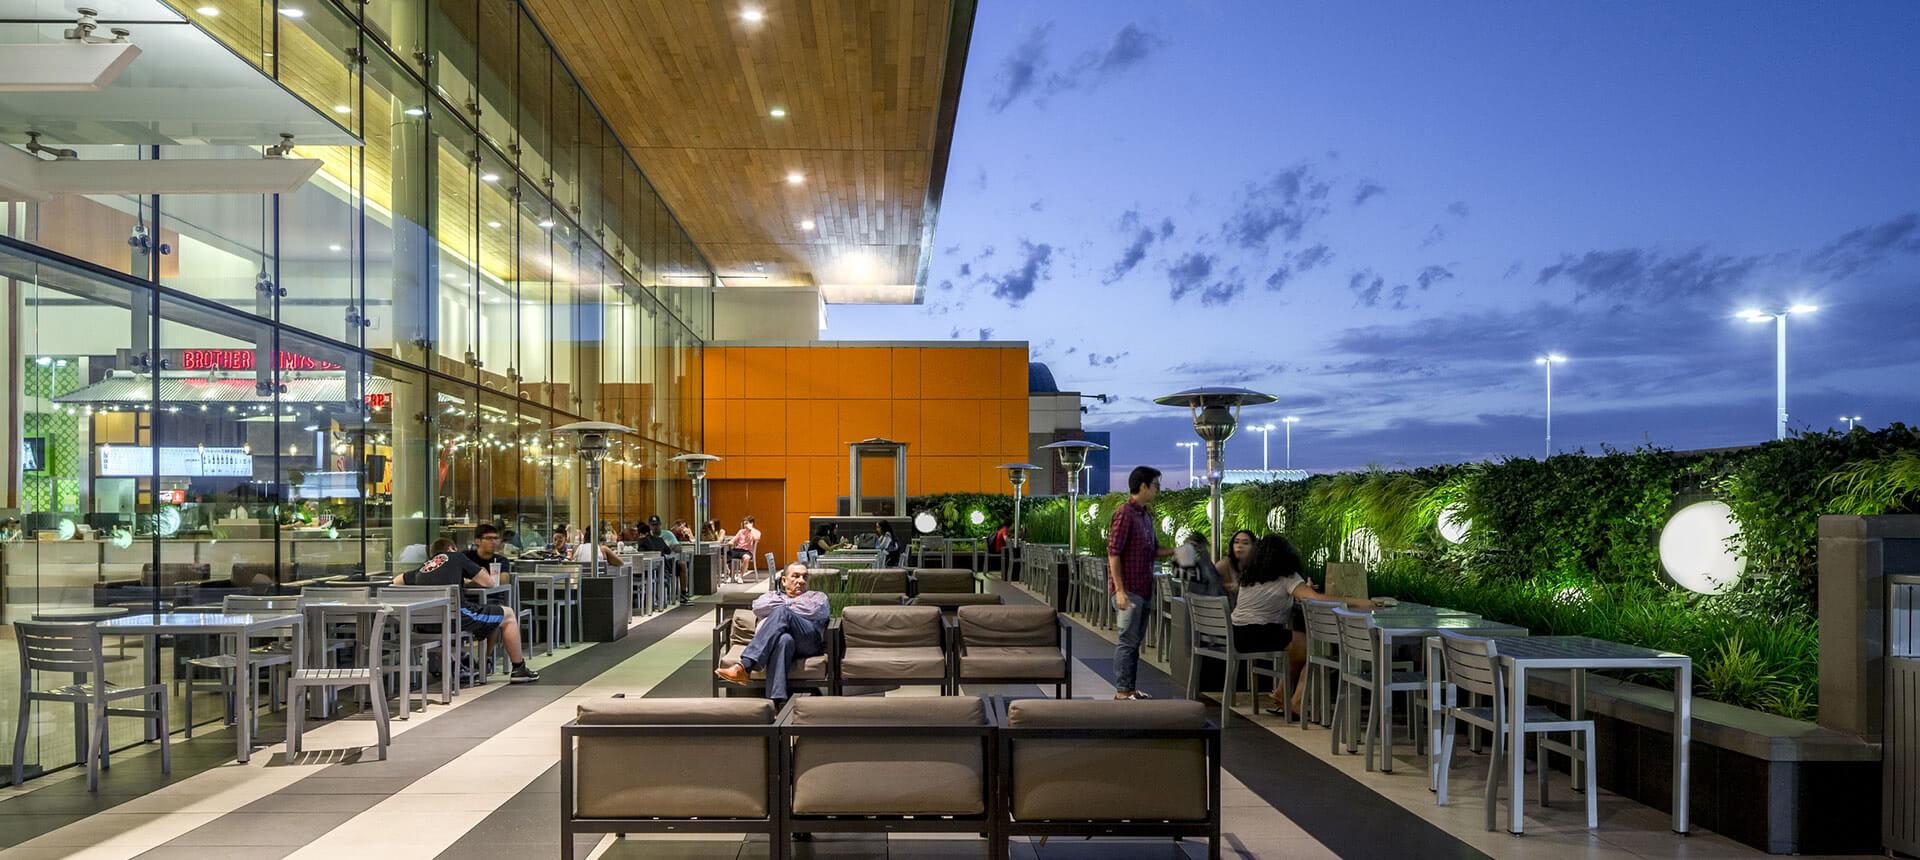 Roosevelt Field Mall Expansion - CallisonRTKL